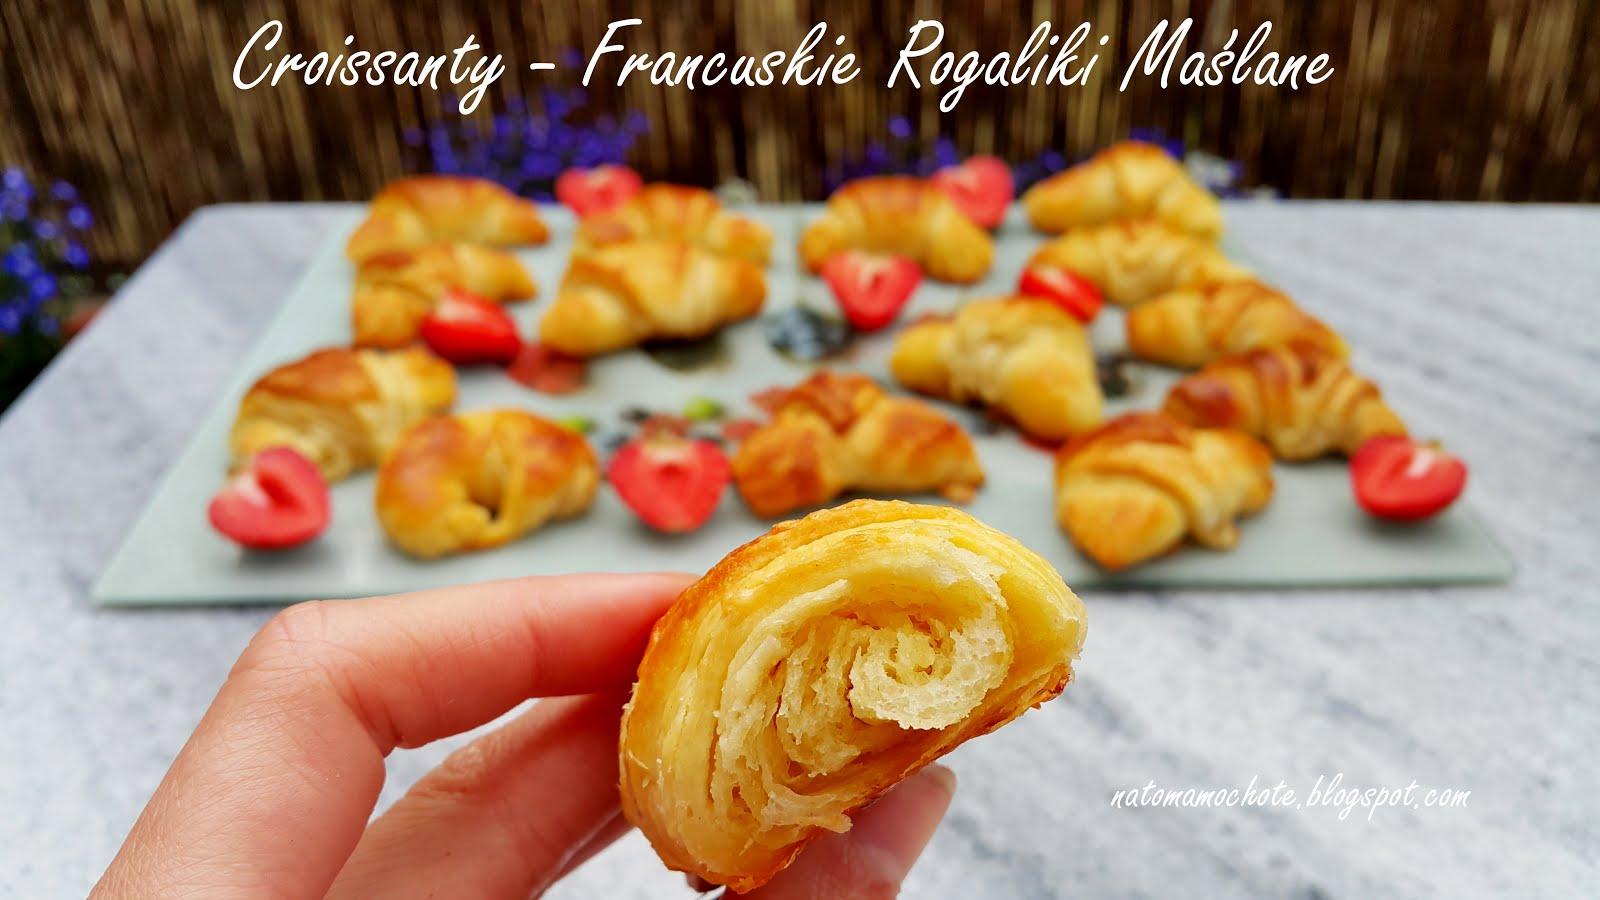 Croissants - Domowe Maślane Rogaliki